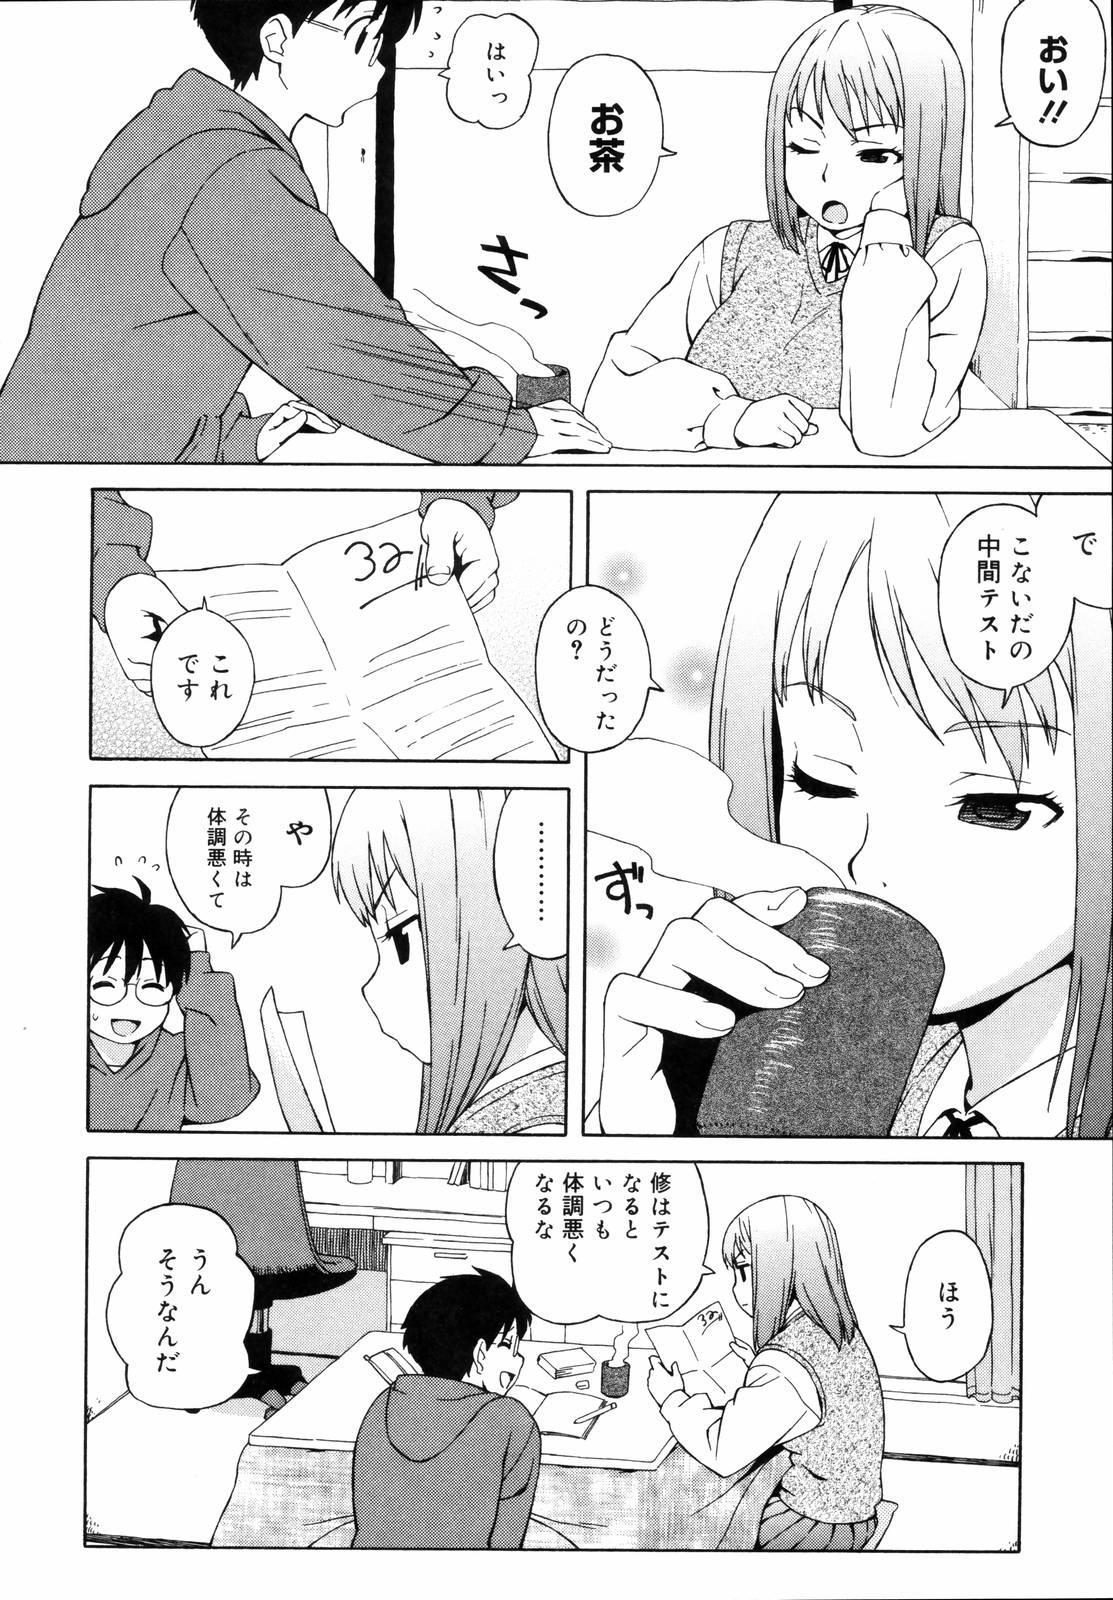 Shishunki wa Hatsujouki - Adolescence is a sexual excitement period. 151